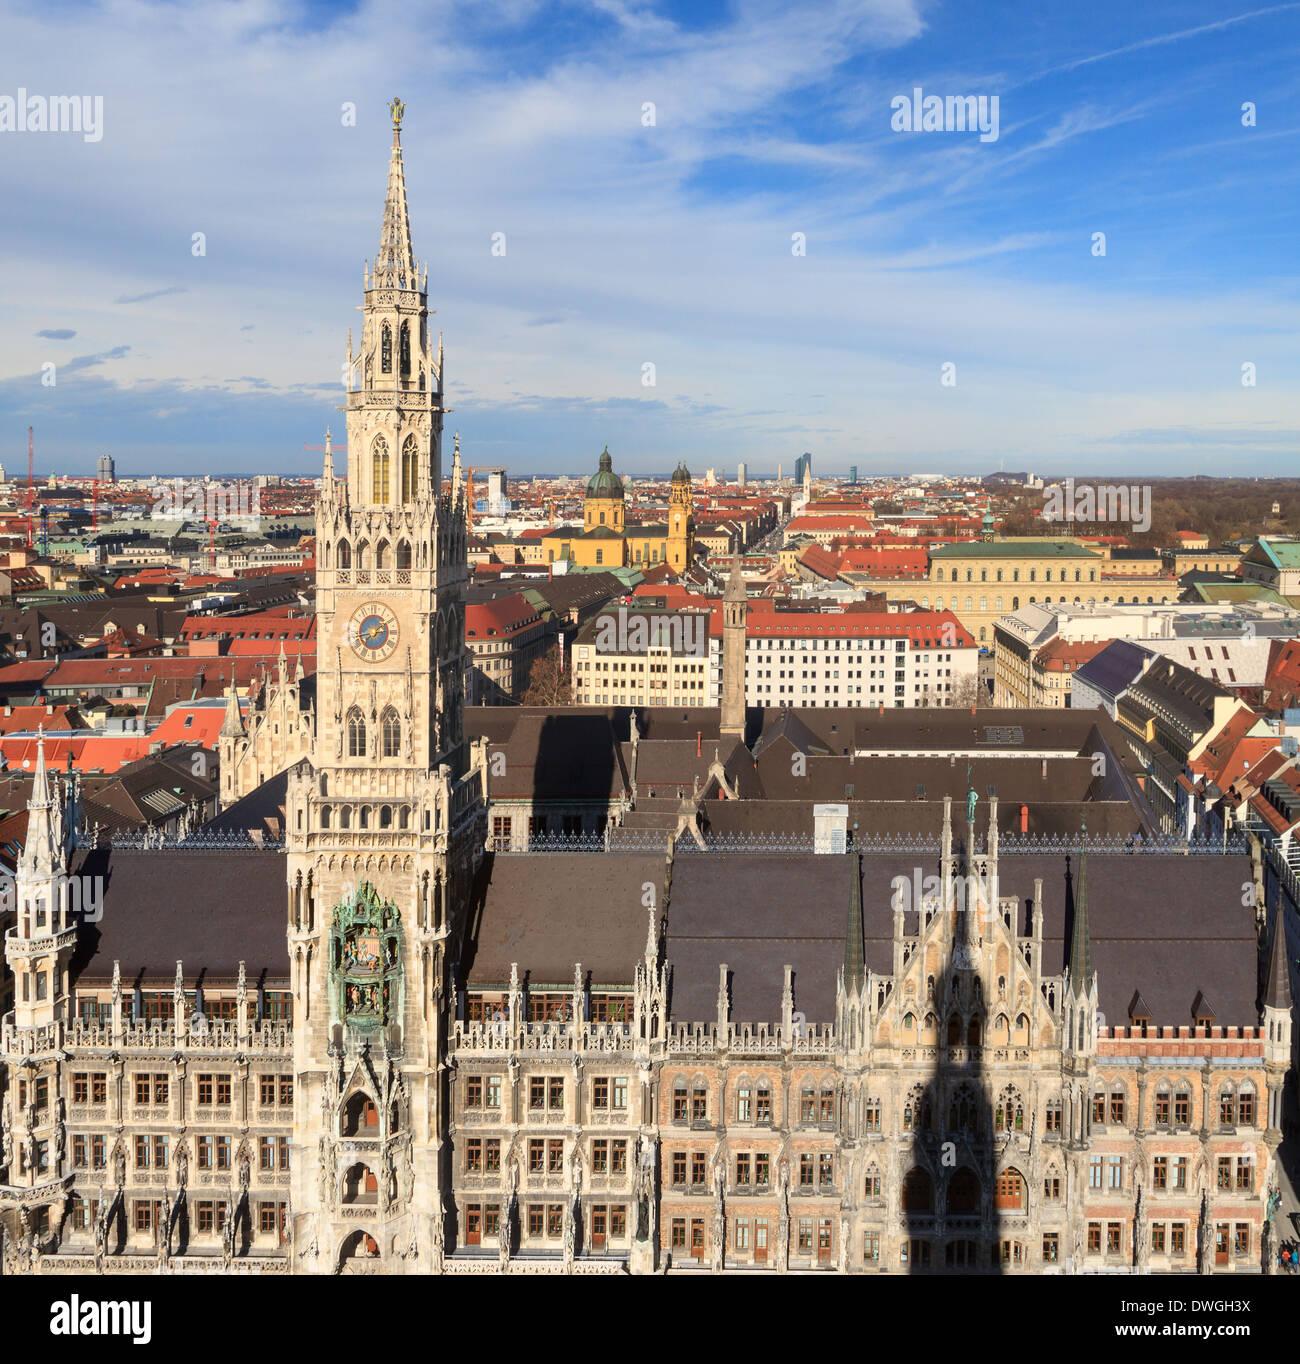 Munich, Gothic City Hall at Marienplatz, Bavaria, Germany - Stock Image